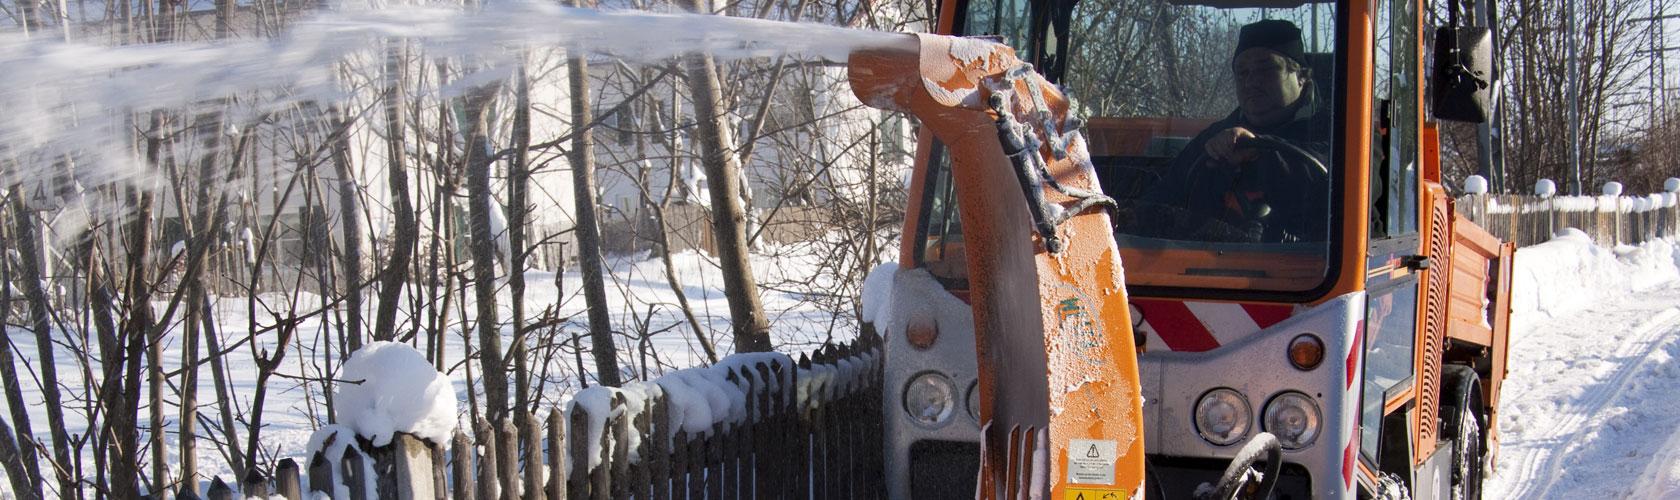 Winterdienst Schneeräumfahrzeug